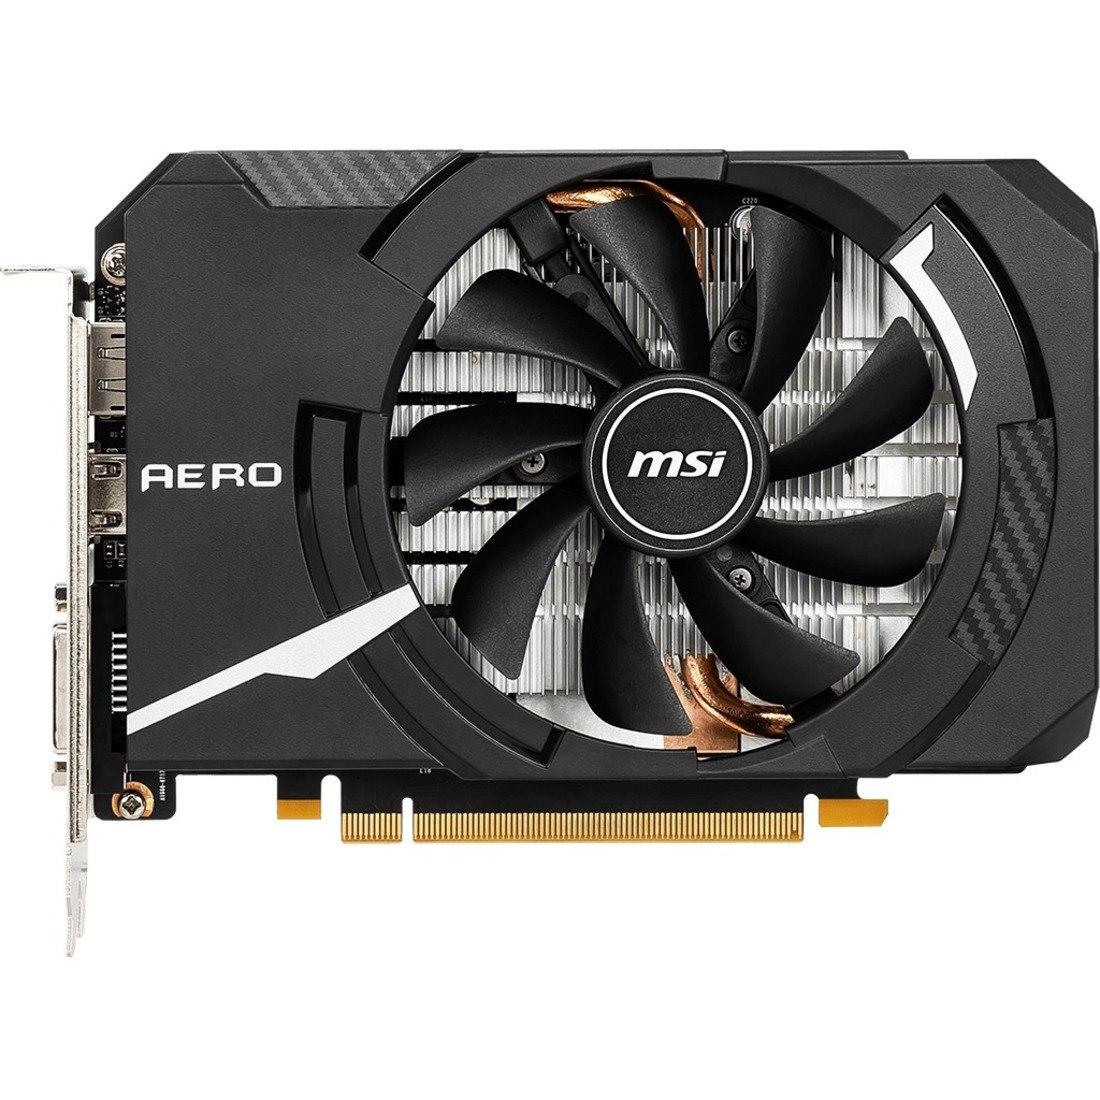 MSI AERO GEFORCE GTX 1660 SUPER AERO ITX OC GeForce GTX 1660 SUPER Graphic Card - 6 GB GDDR6